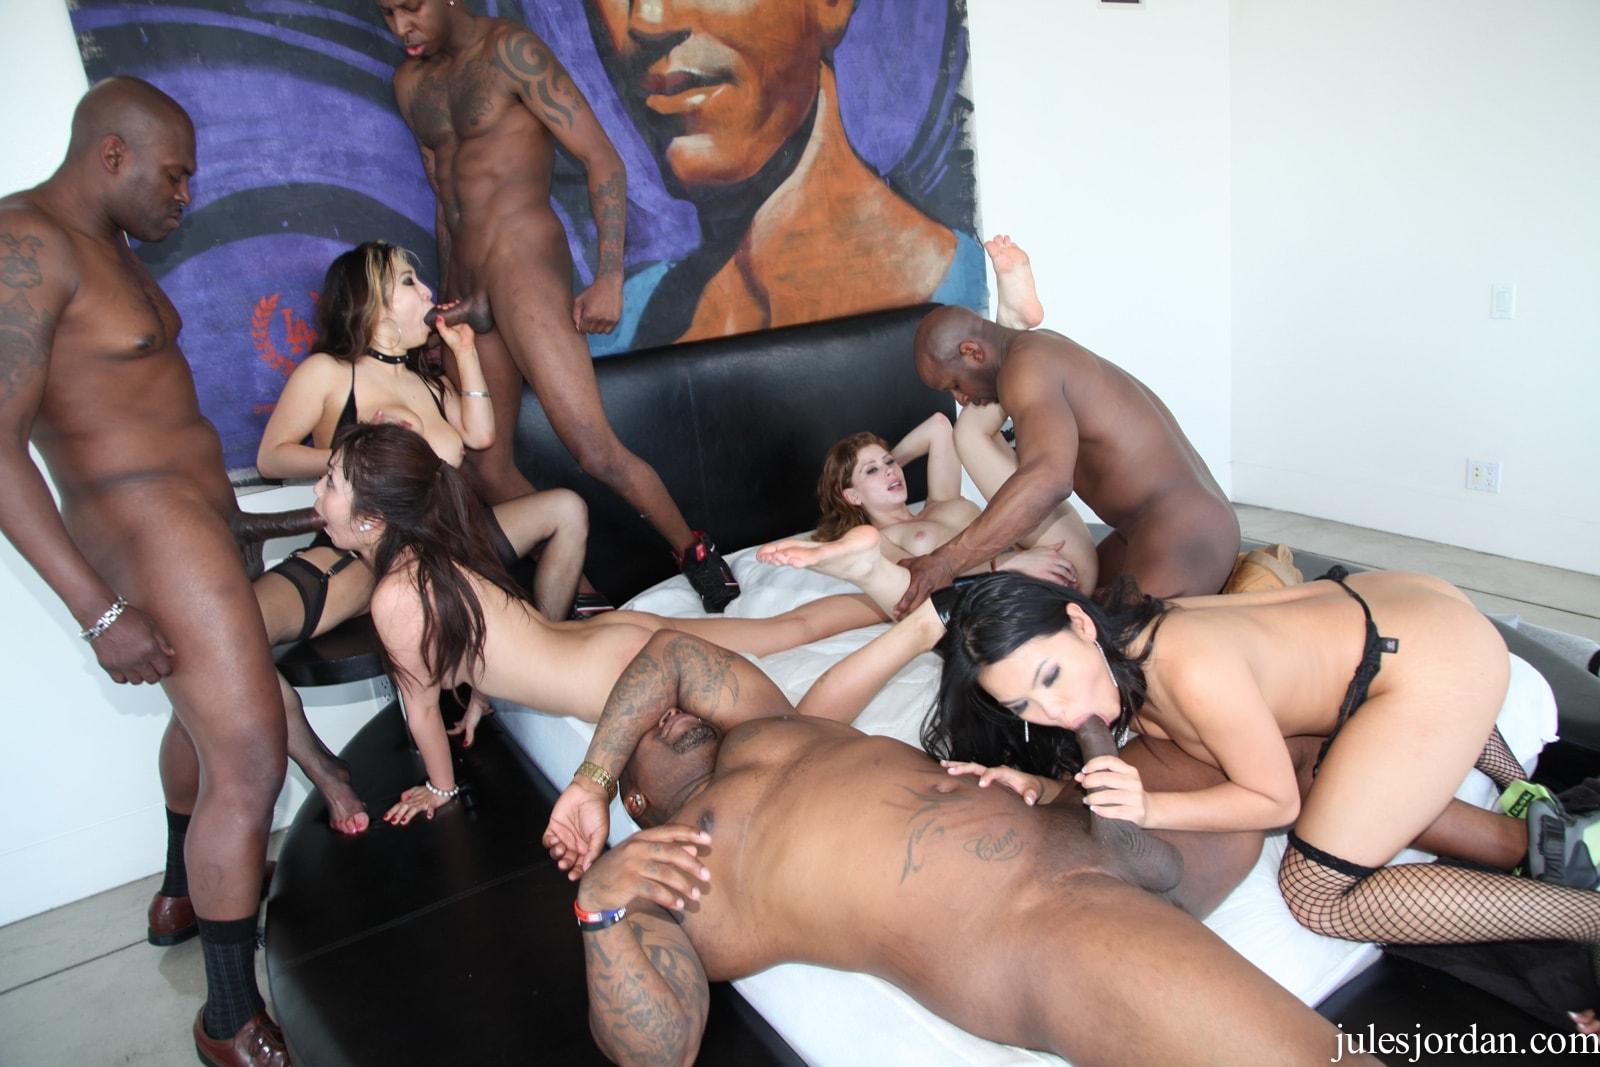 Free asian orgy porn pics